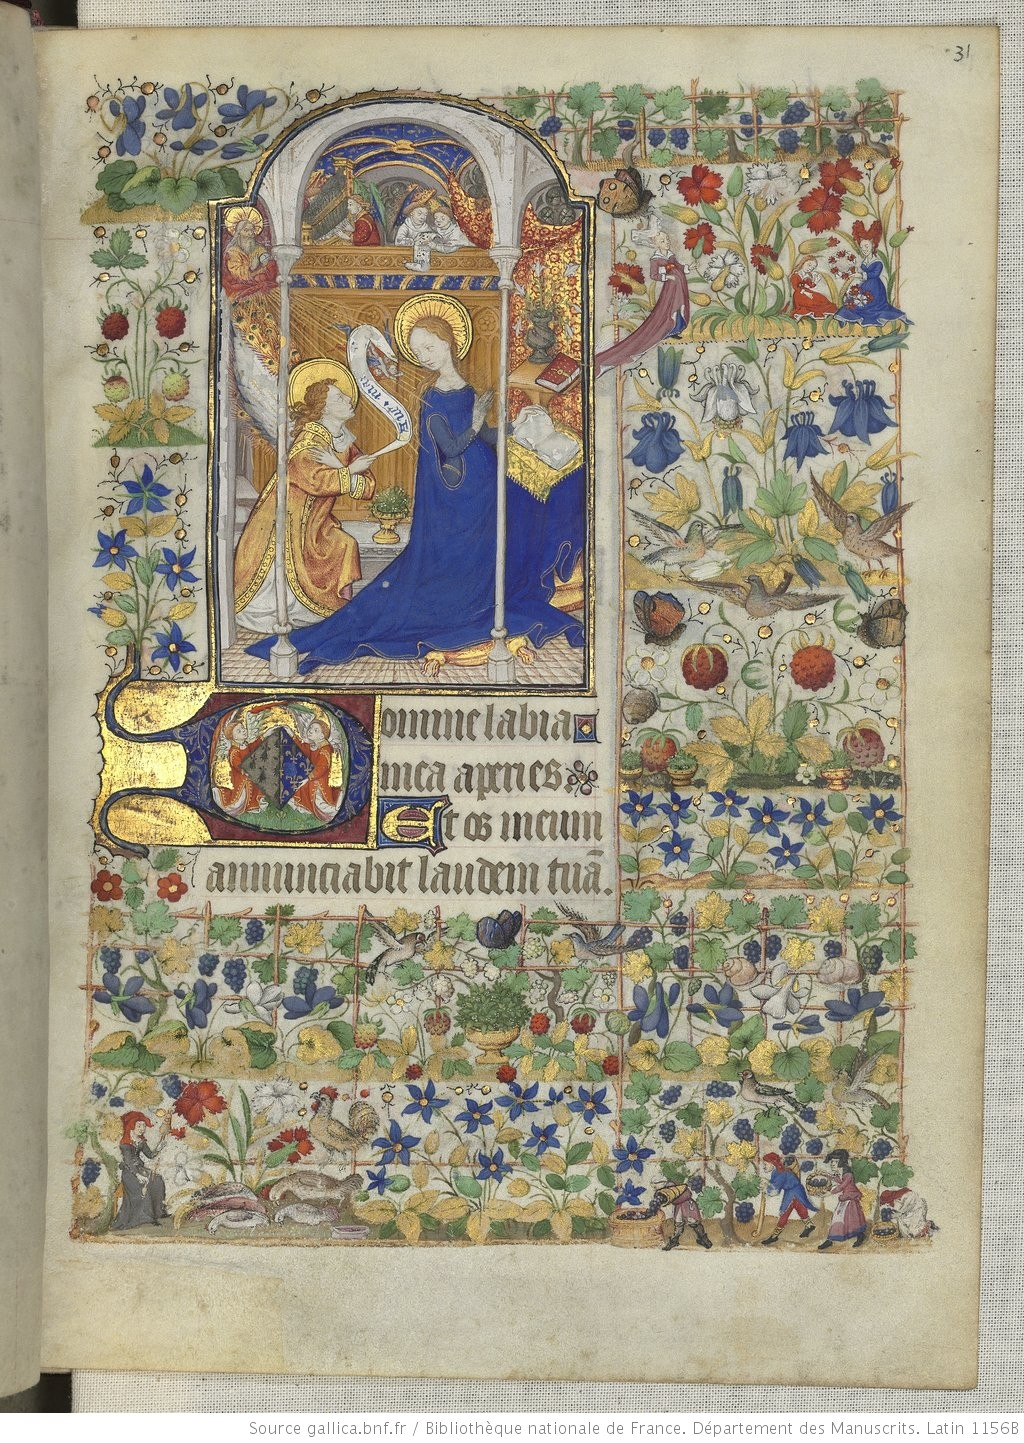 Heures de Marguerite d'Orleans 1430 ca BNF Latin 1156B fol 31r Gallica